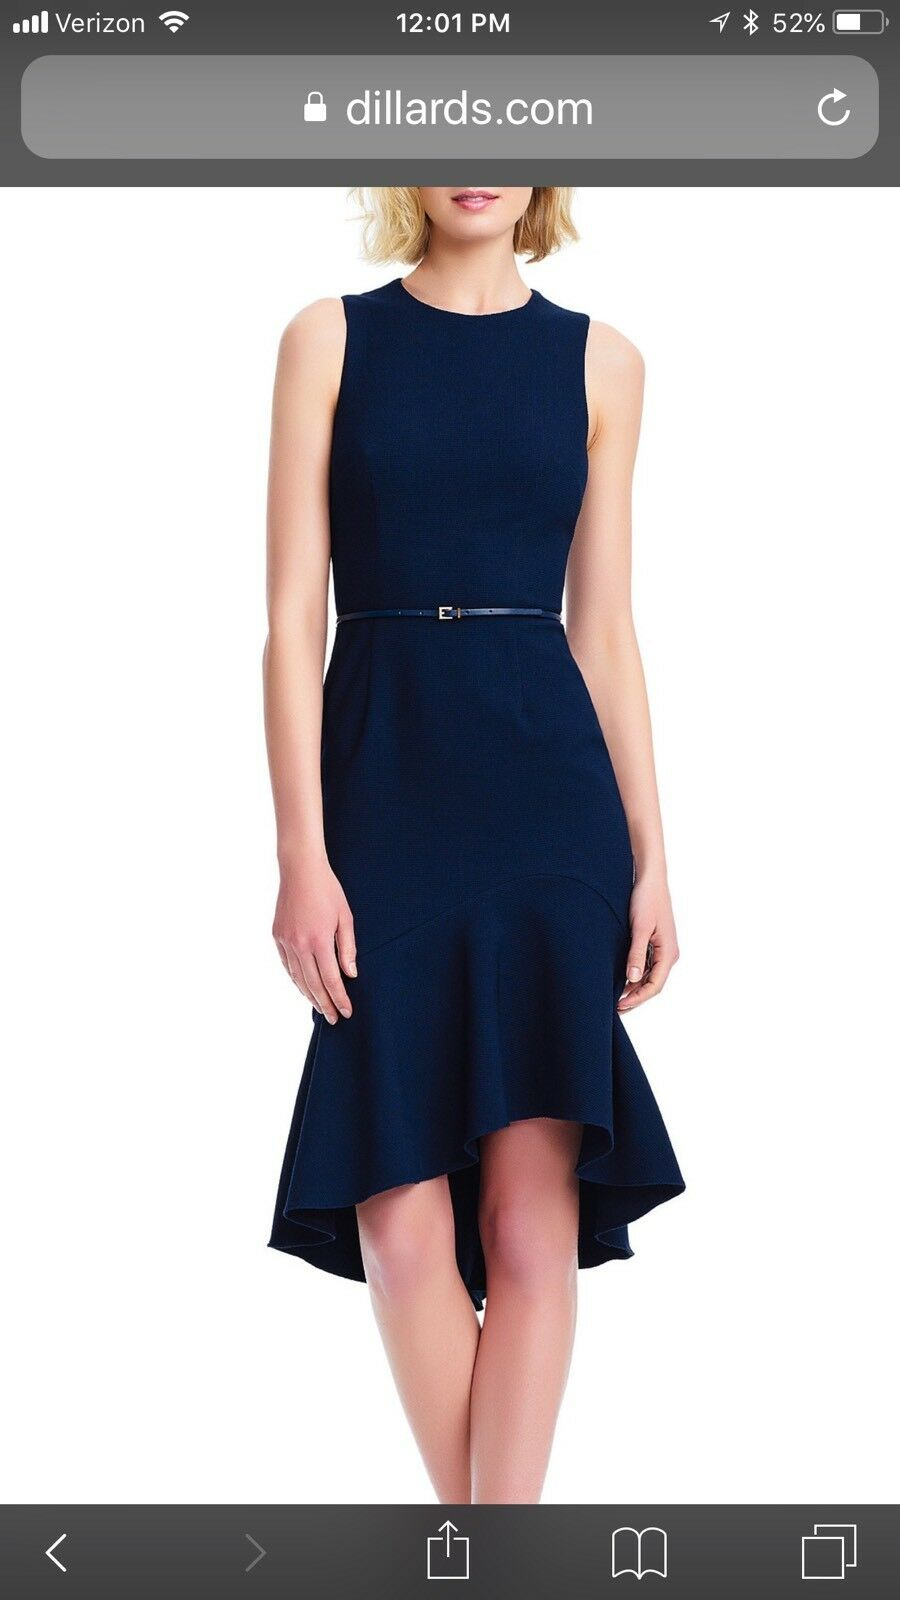 ADRAINANA PAPELL DRESS NAVY HIGH LOW DRESS Größe 22W RETAIL NEW WITH TAG